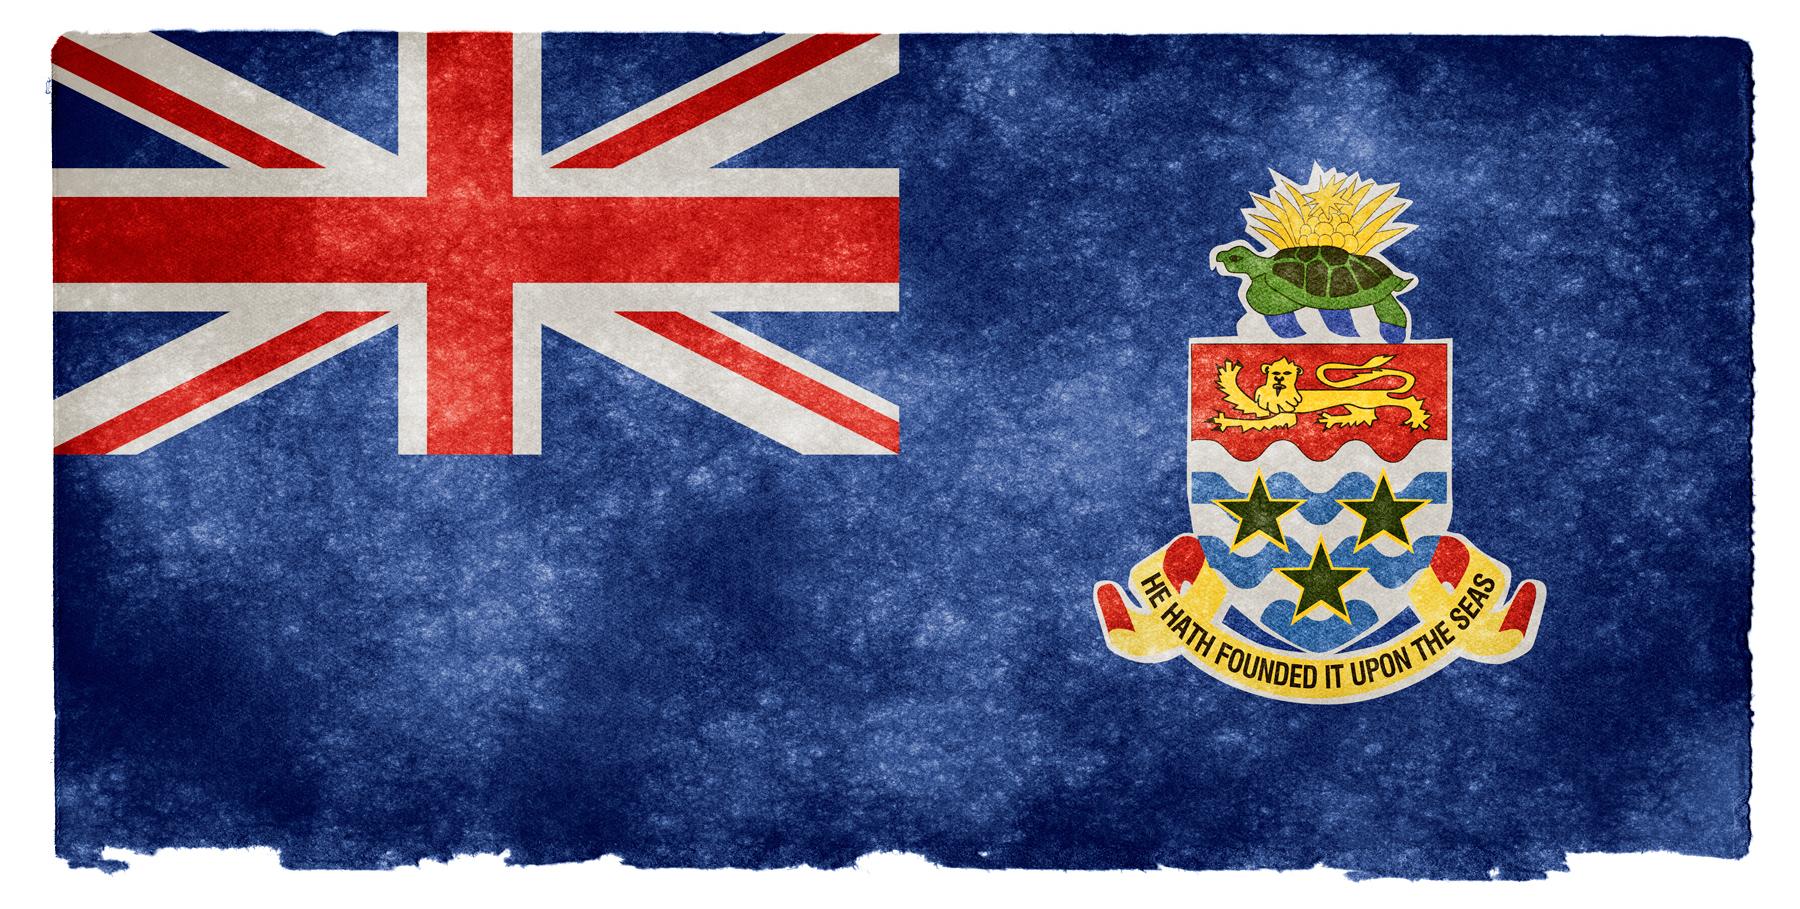 Cayman islands grunge flag photo